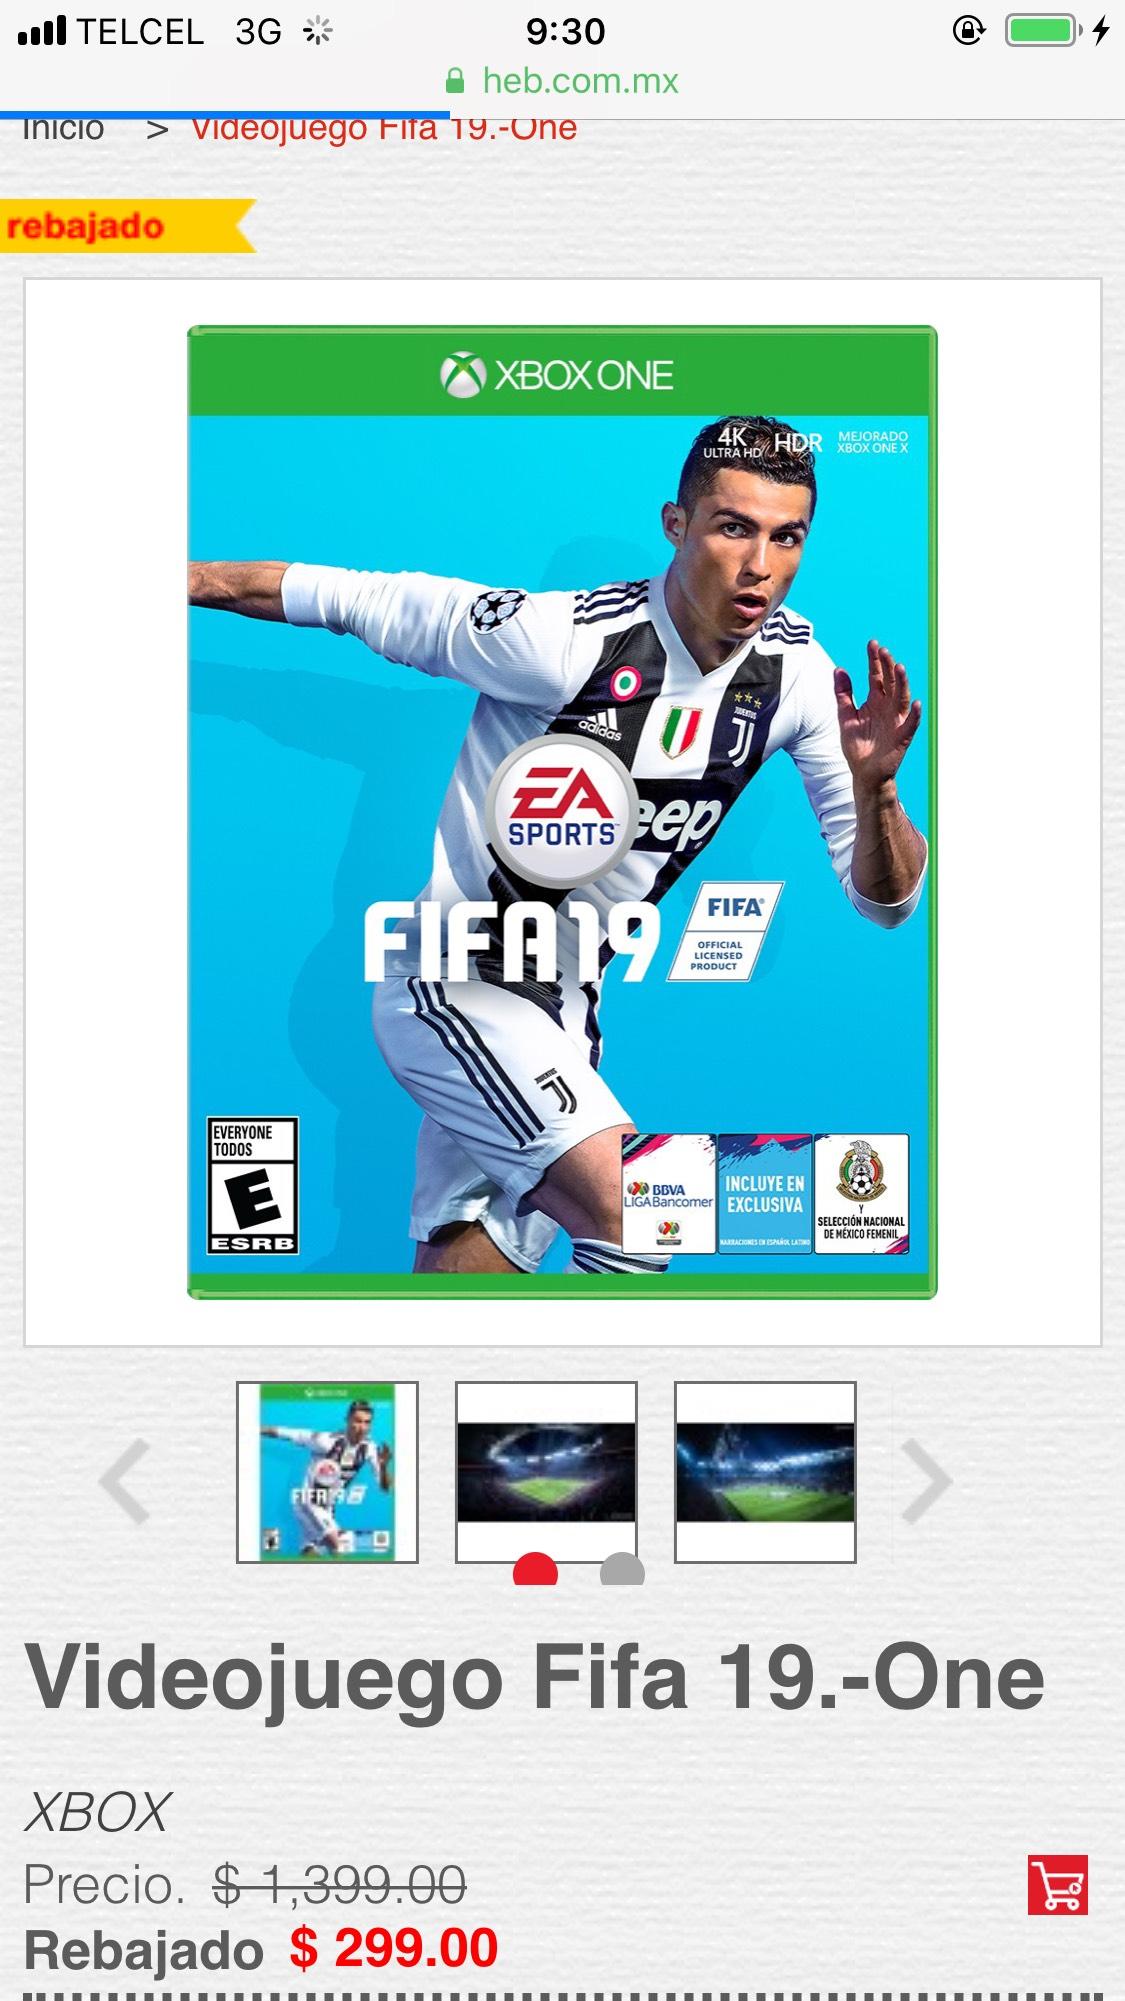 FIFA 19 HEB Mexico